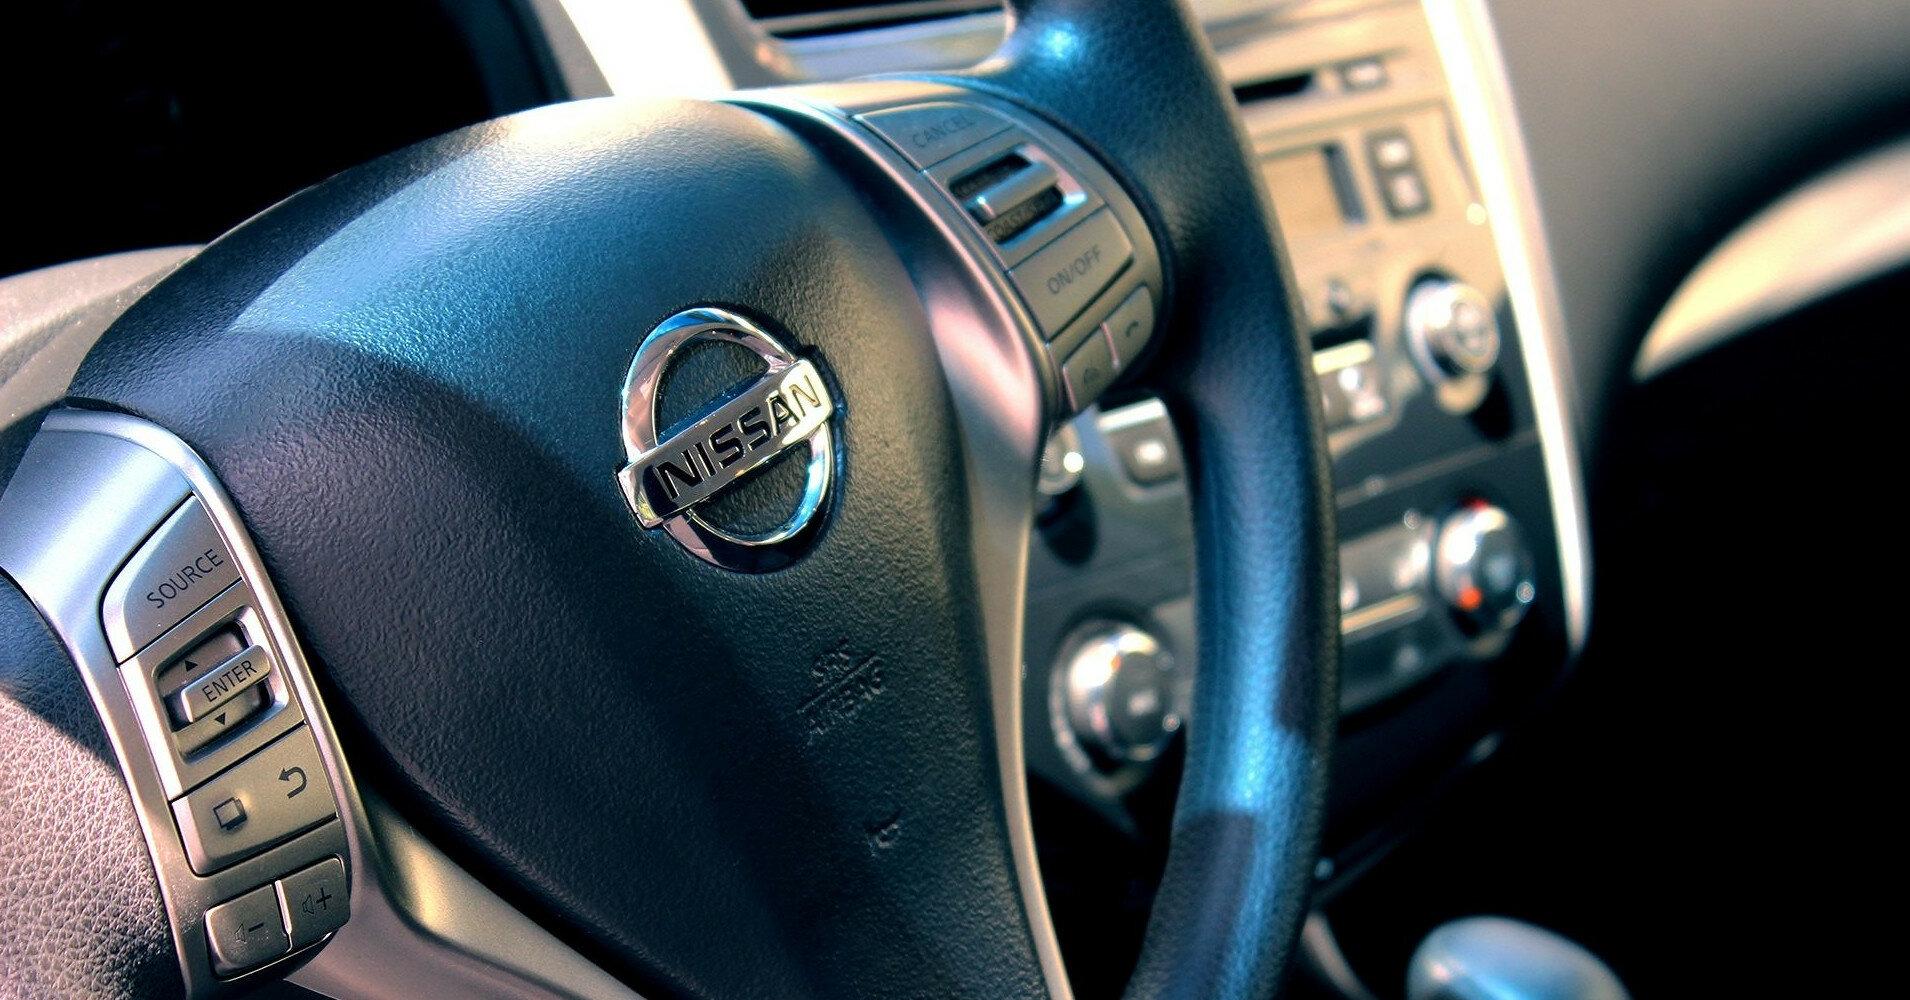 Nissan презентовала долгожданный спорткар Z